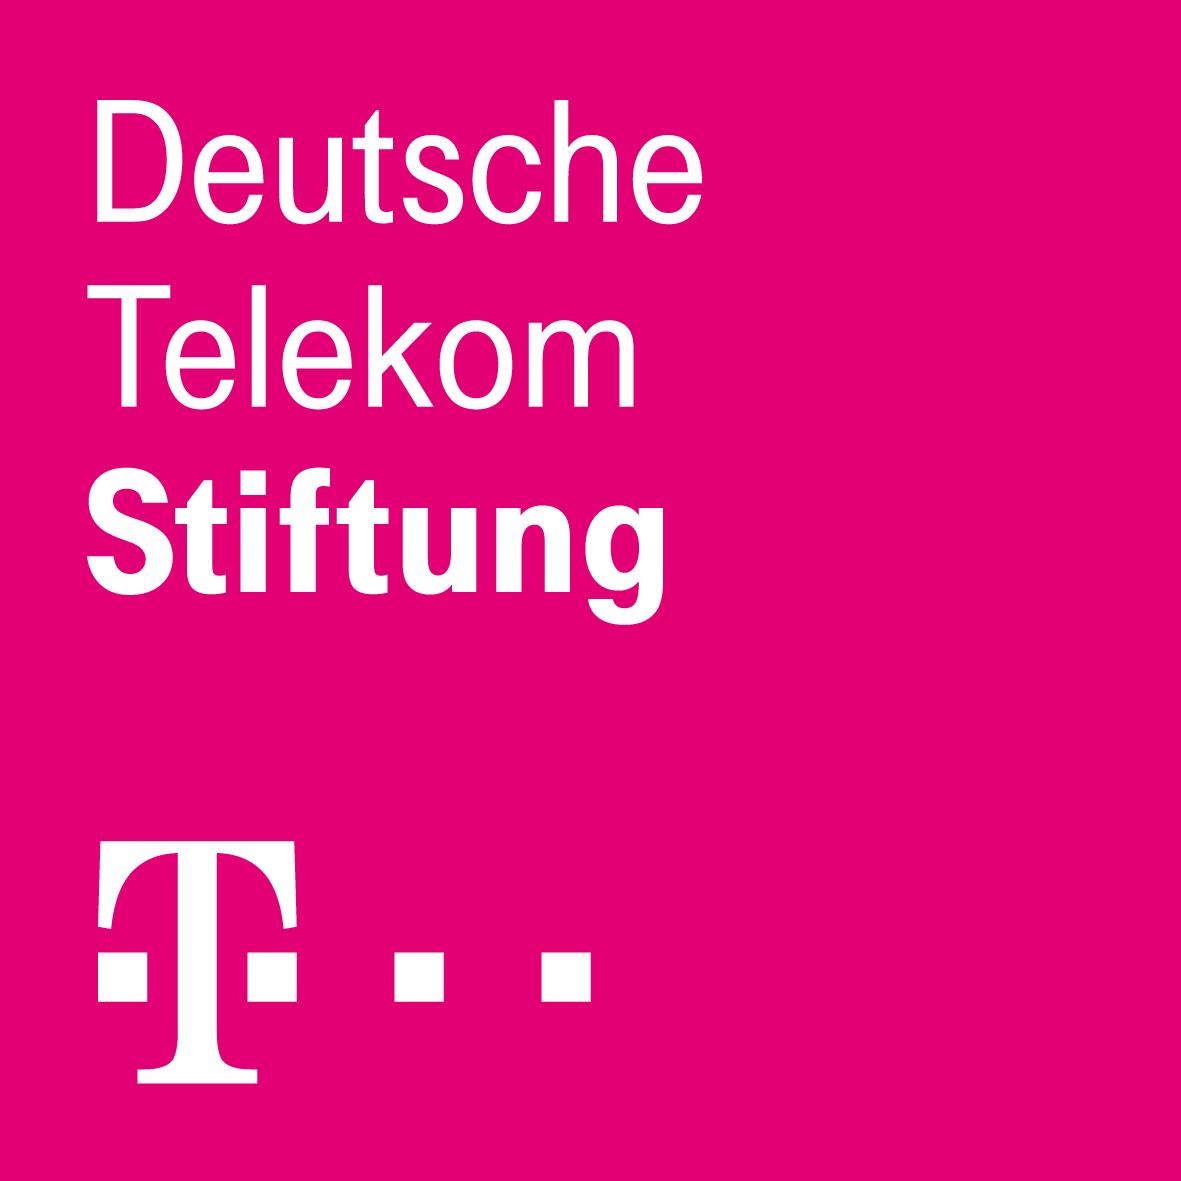 Telekom Stiftung